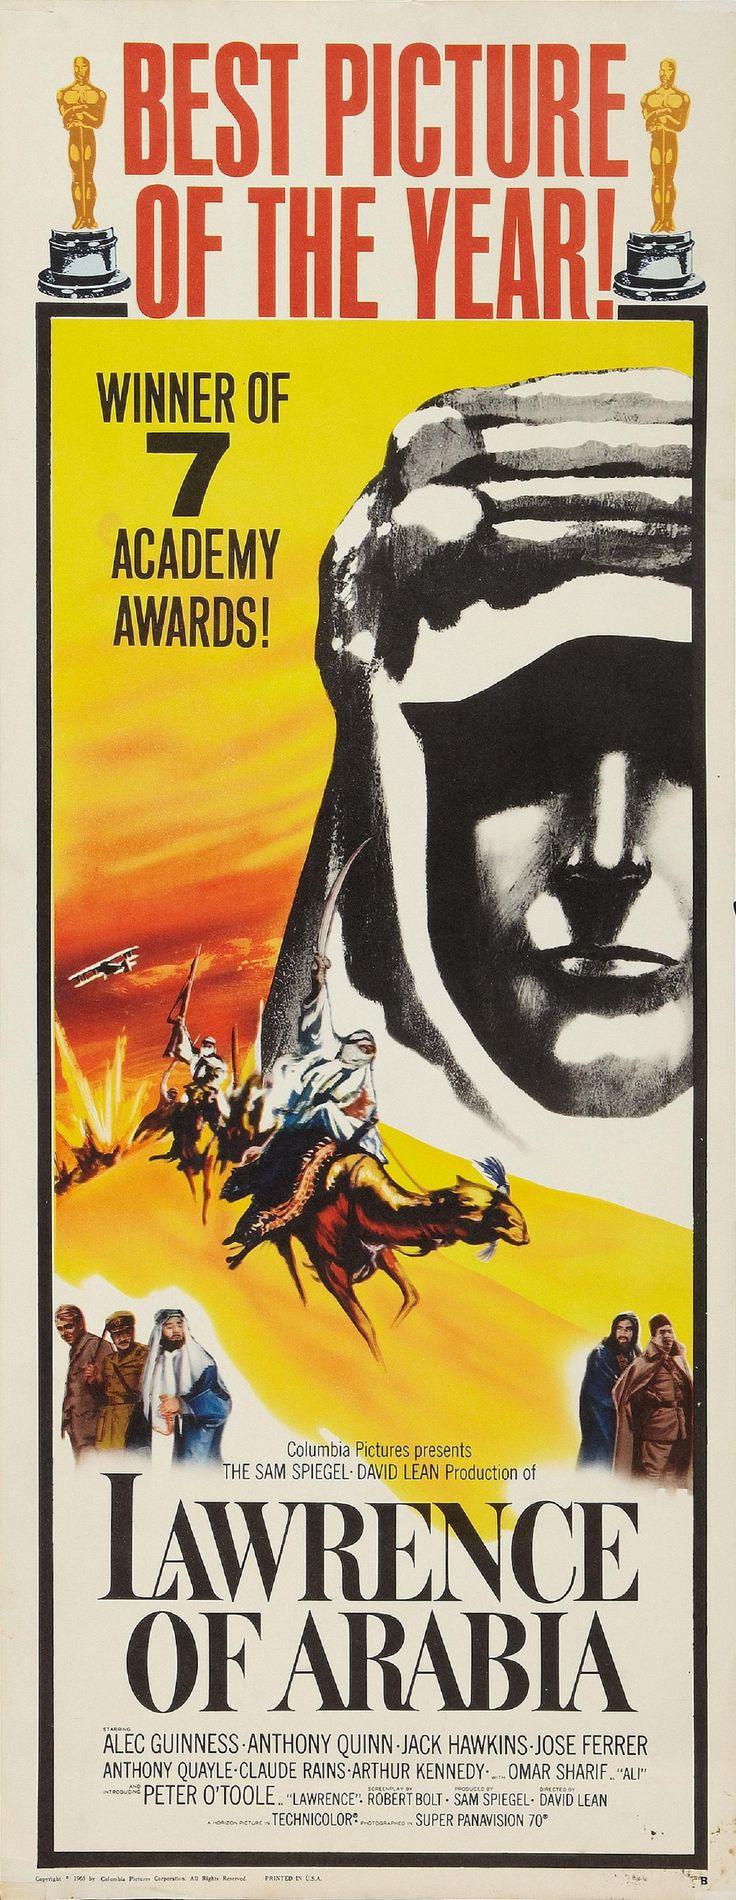 """Lawrence of Arabia"" (1962). Country: United Kingdom. Director: David Lean."